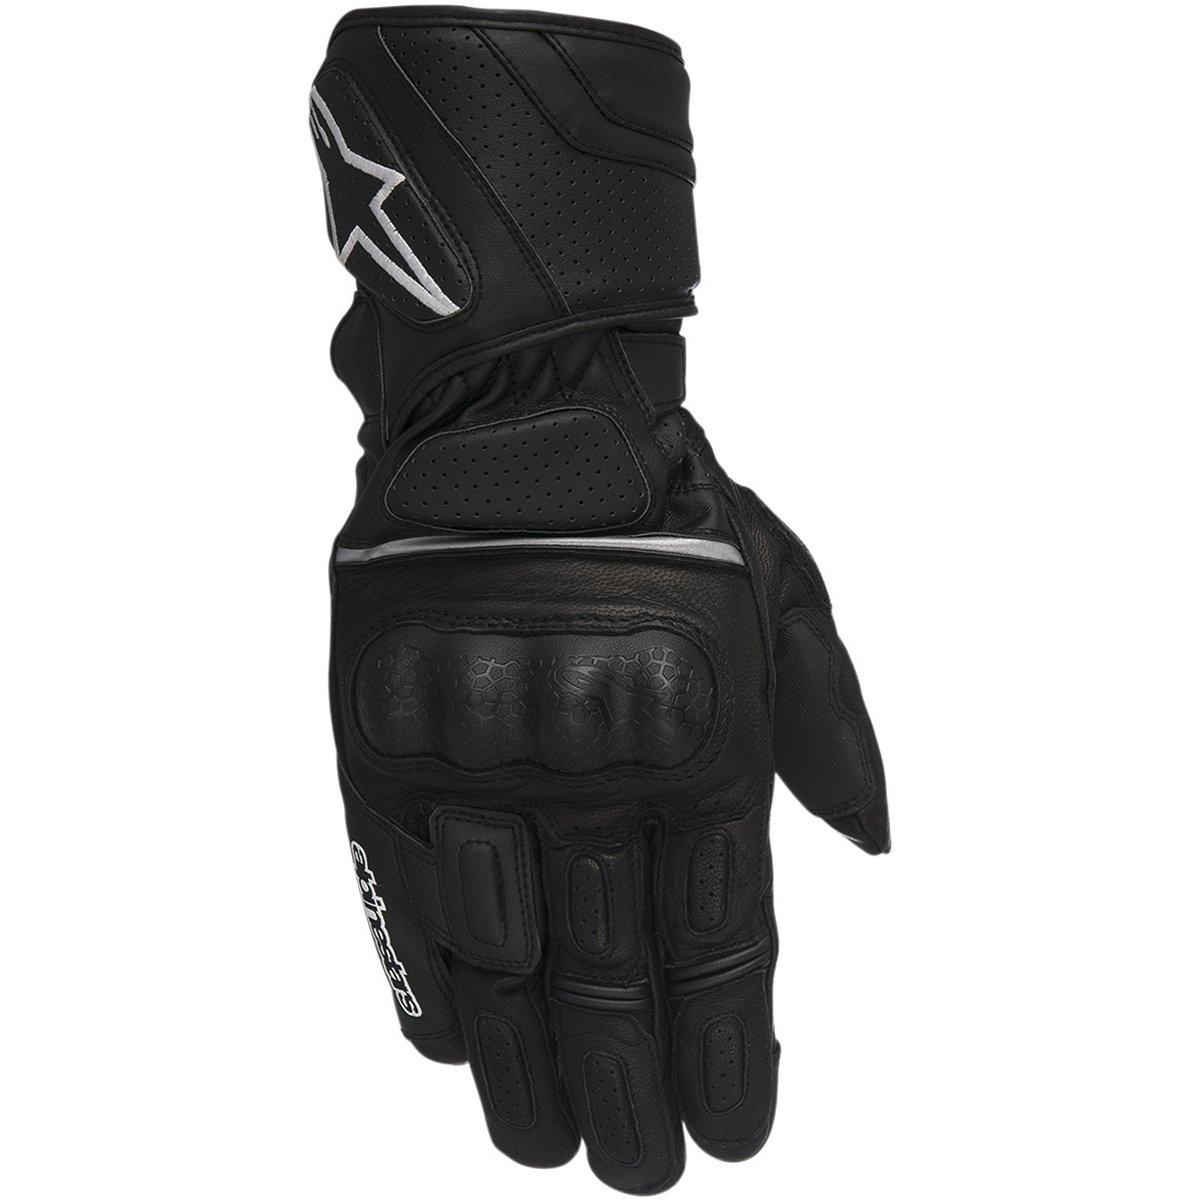 Alpinestars SP-Z Drystar Men's Street Motorcycle Gloves - Black / X-Large